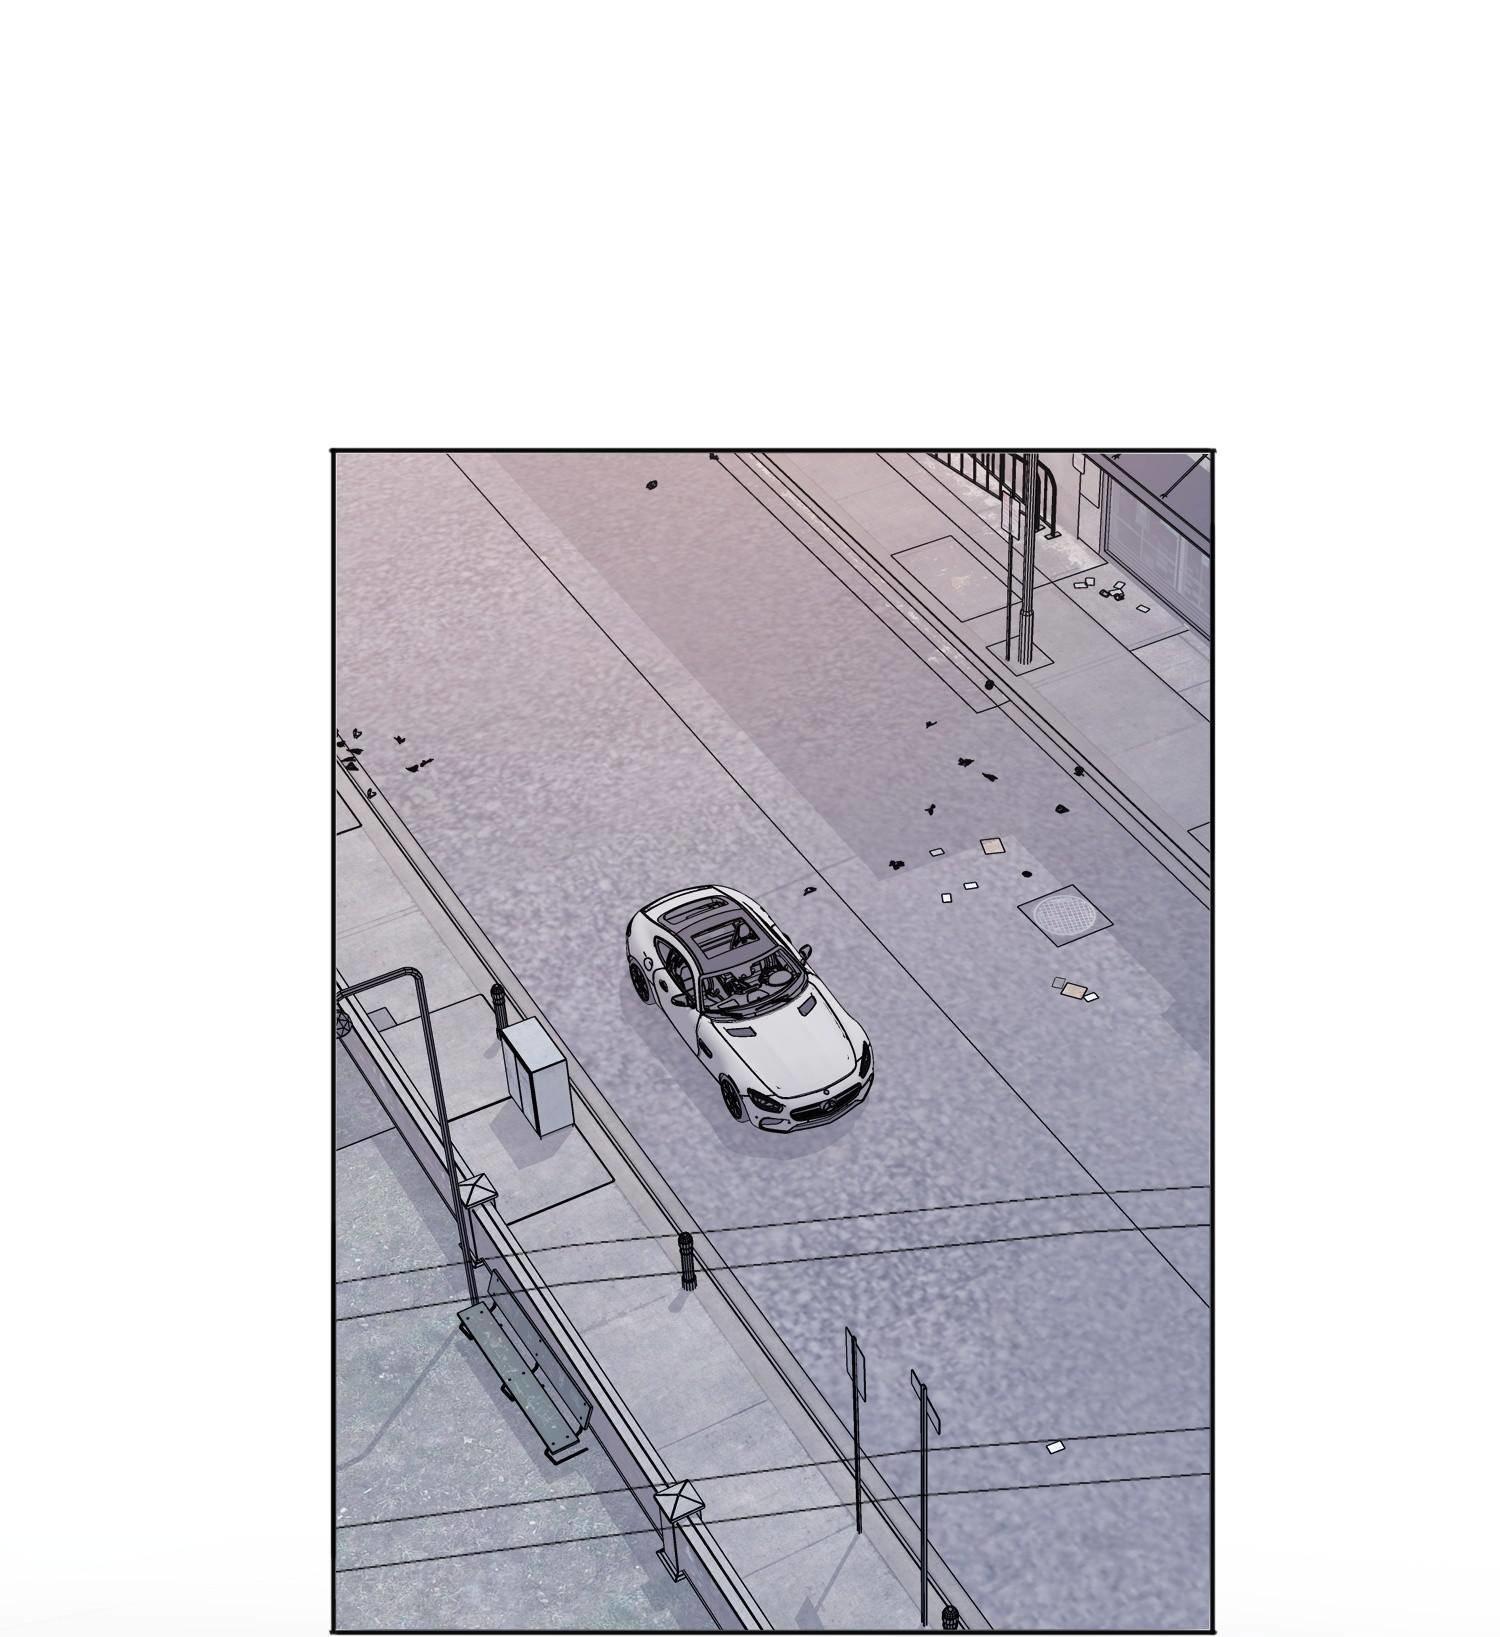 I Offer My Neck To You Chapter 68 page 2 - Mangakakalot